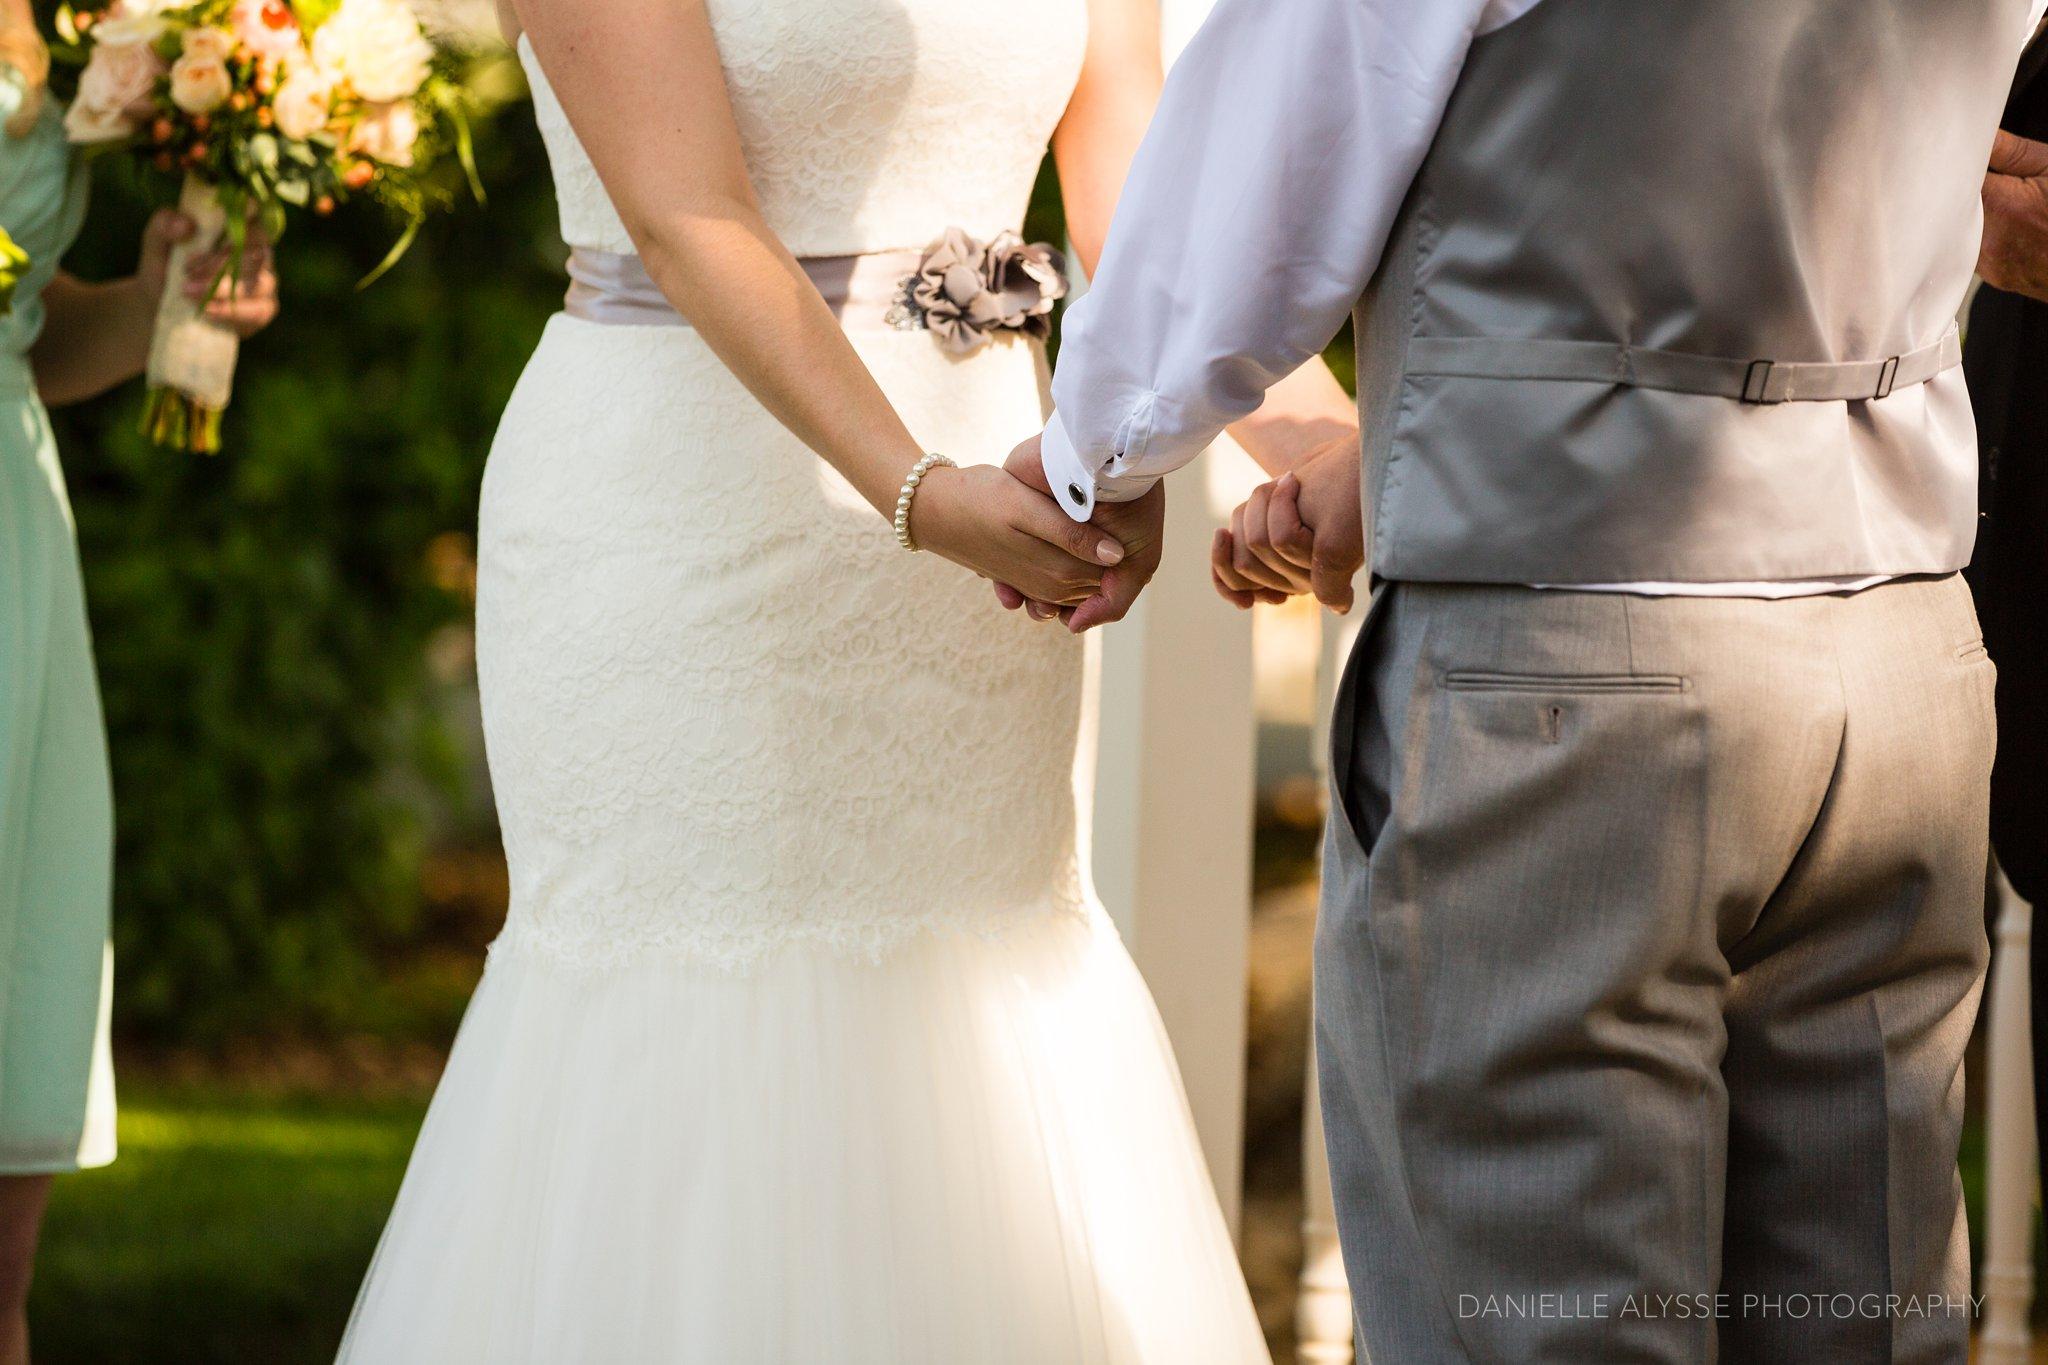 170507_blog_megan_david_wedding_loomis_flower_farm_inn_danielle_alysse_photography_sacramento_photographer0185_WEB.jpg